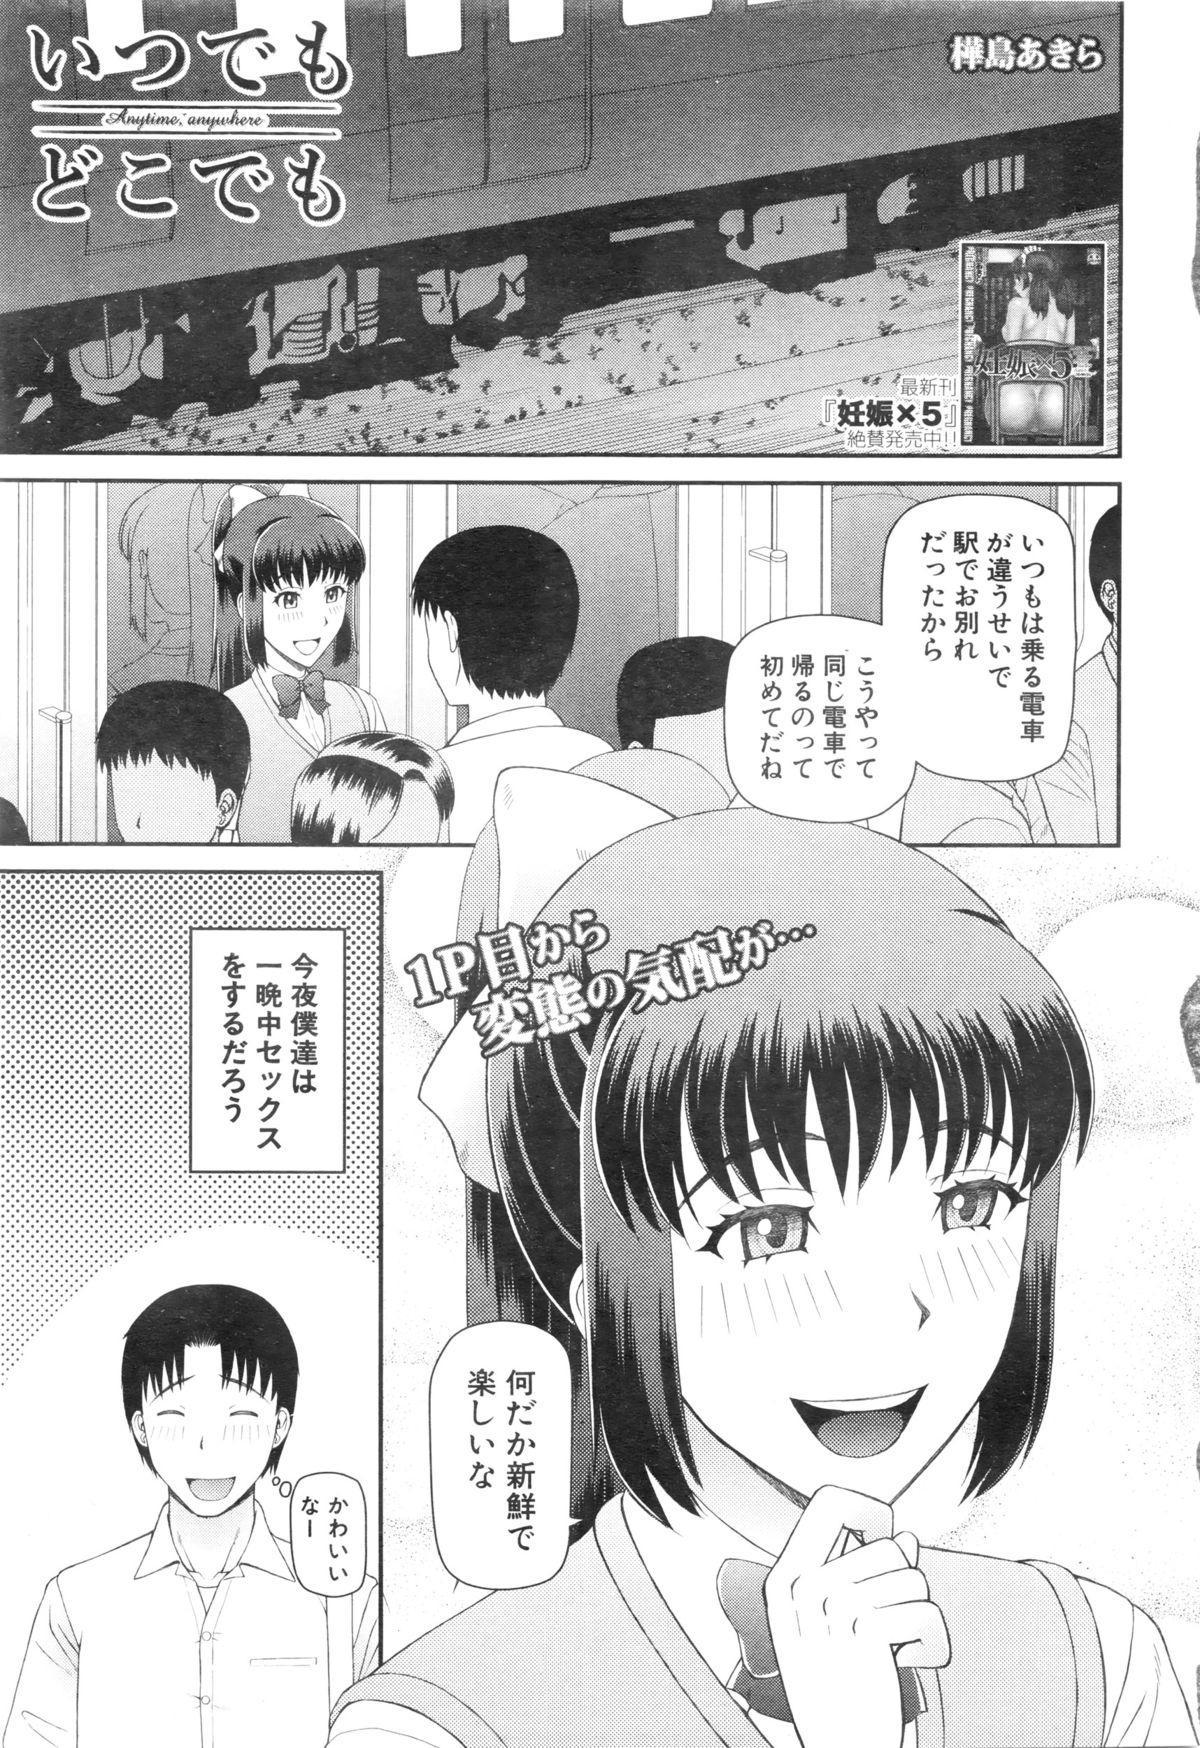 COMIC Mugen Tensei 2016-01 230